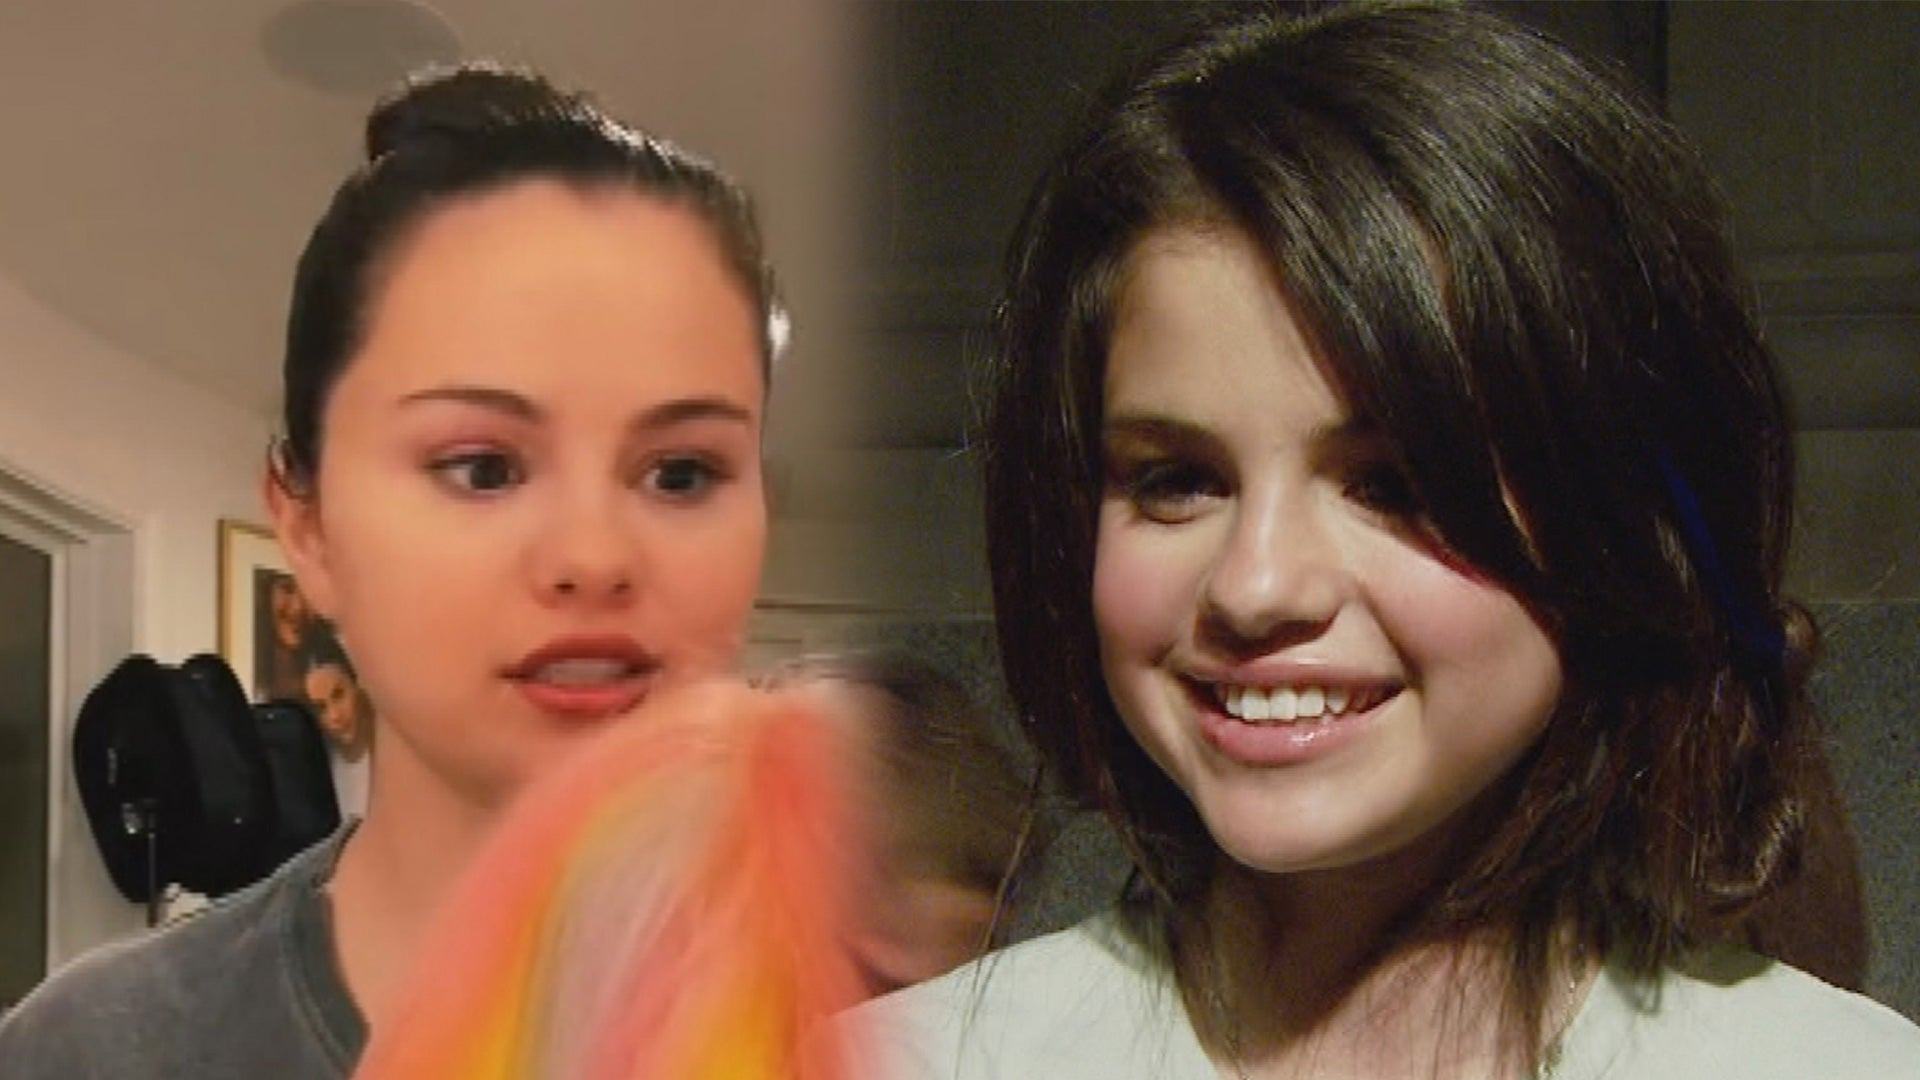 Watch Selena Gomez Make Fun of Her Younger Self in TikTok Video